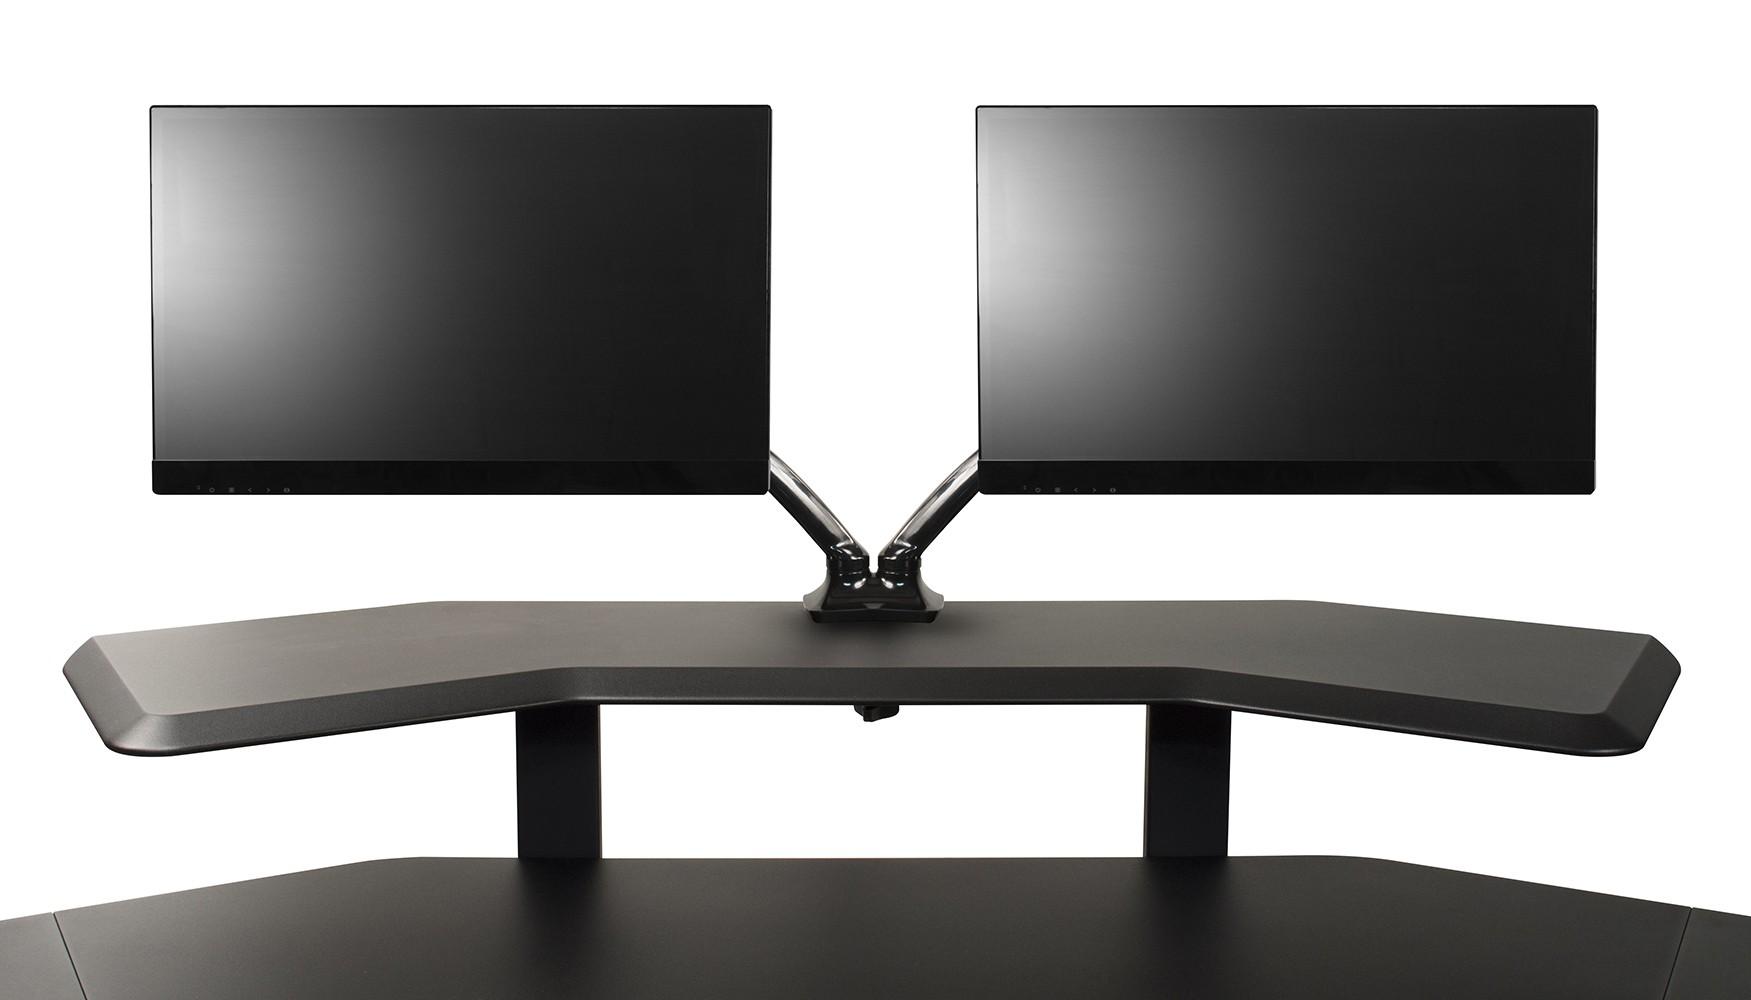 Nucleus Series Studio Desk - Double Monitor Mount